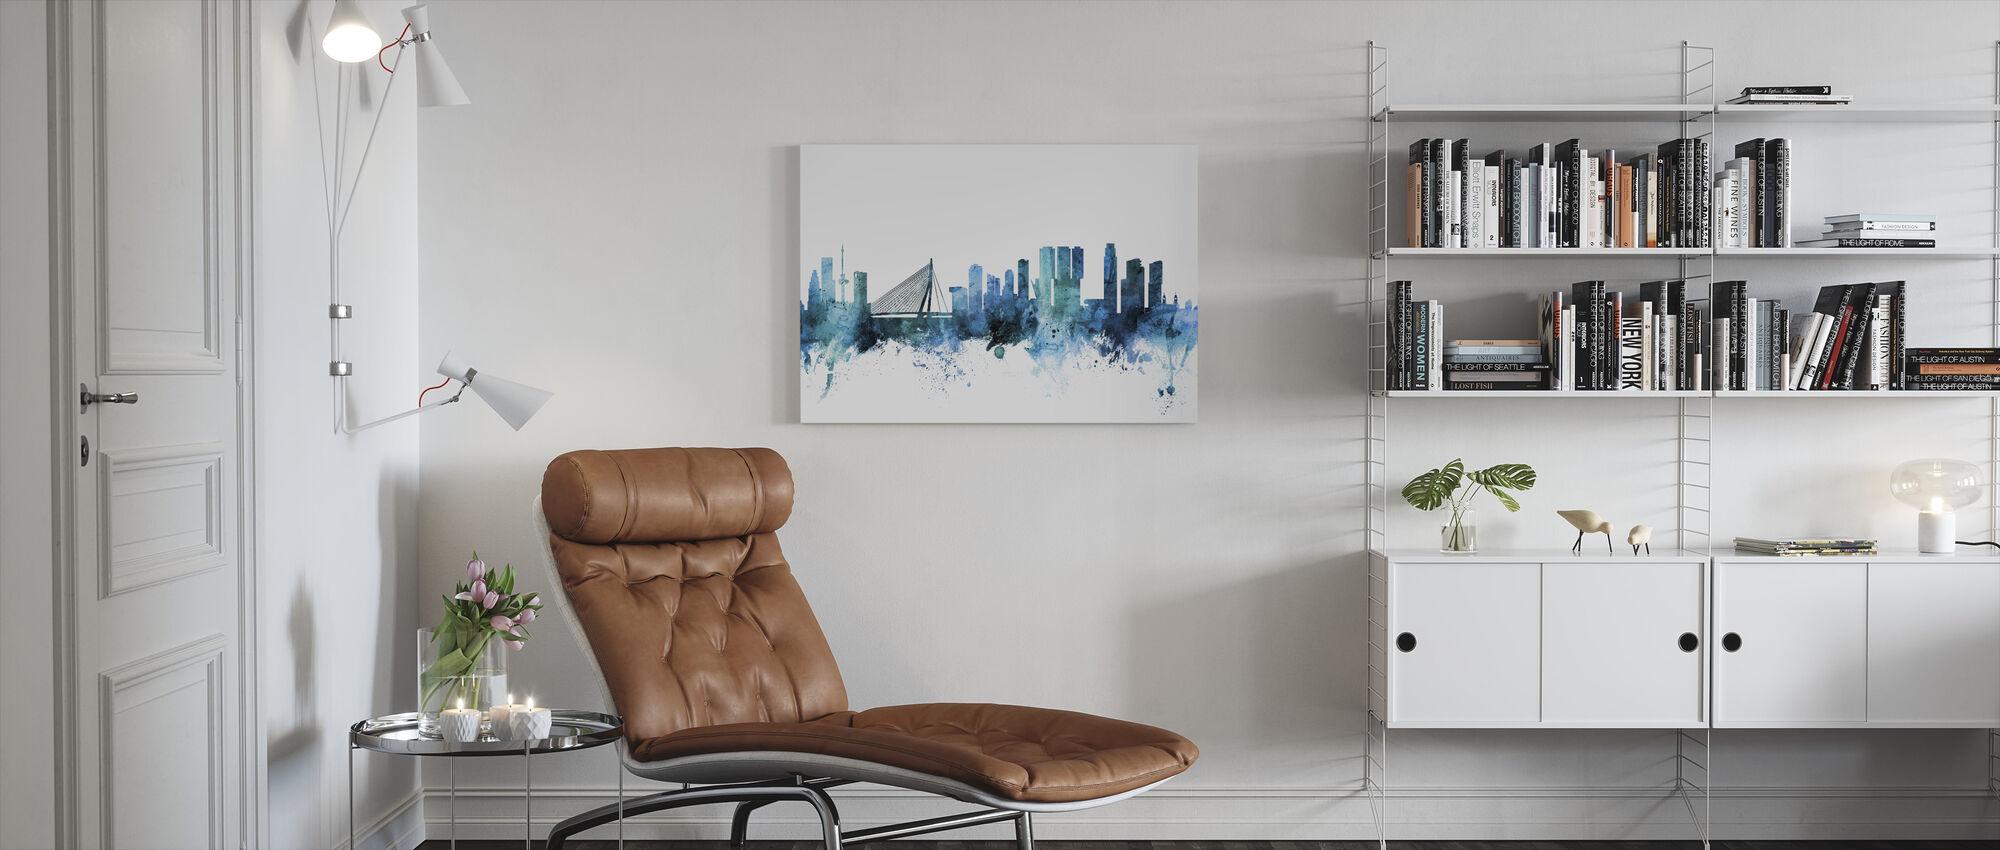 Rotterdam The Netherlands Skyline - Canvas print - Living Room